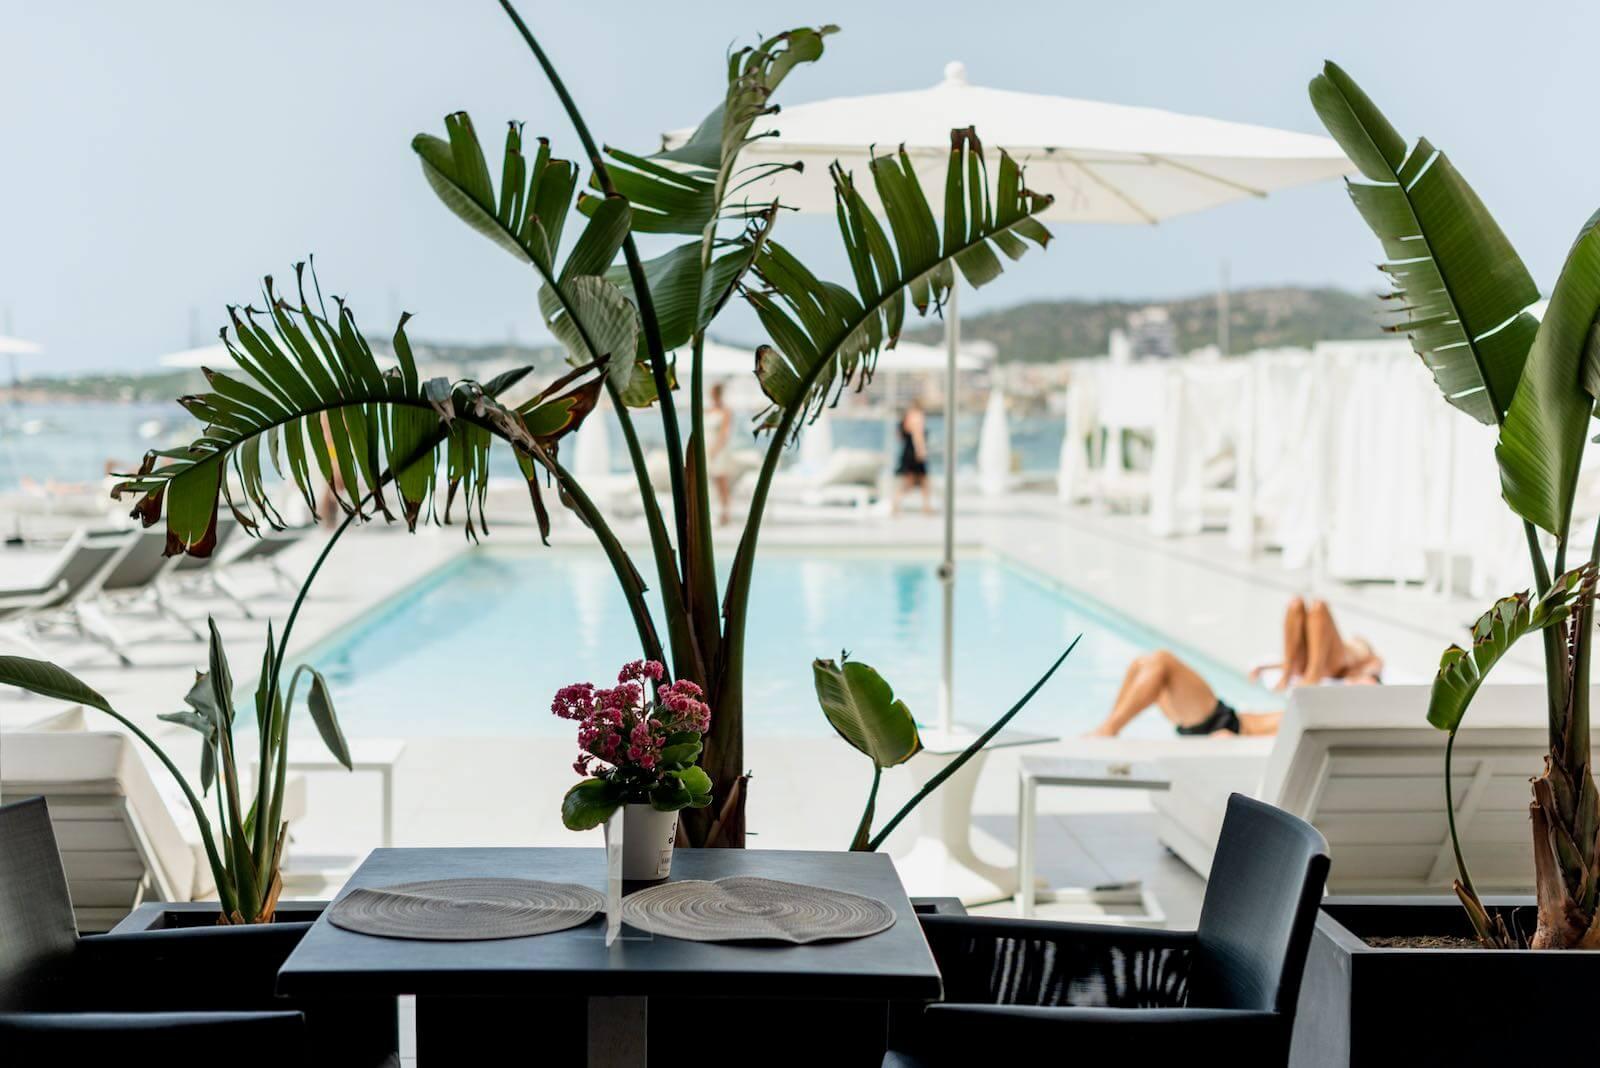 https://www.white-ibiza.com/wp-content/uploads/2020/07/white-ibiza-restaurants-hawker-beach-club-ibiza-2020-03.jpeg